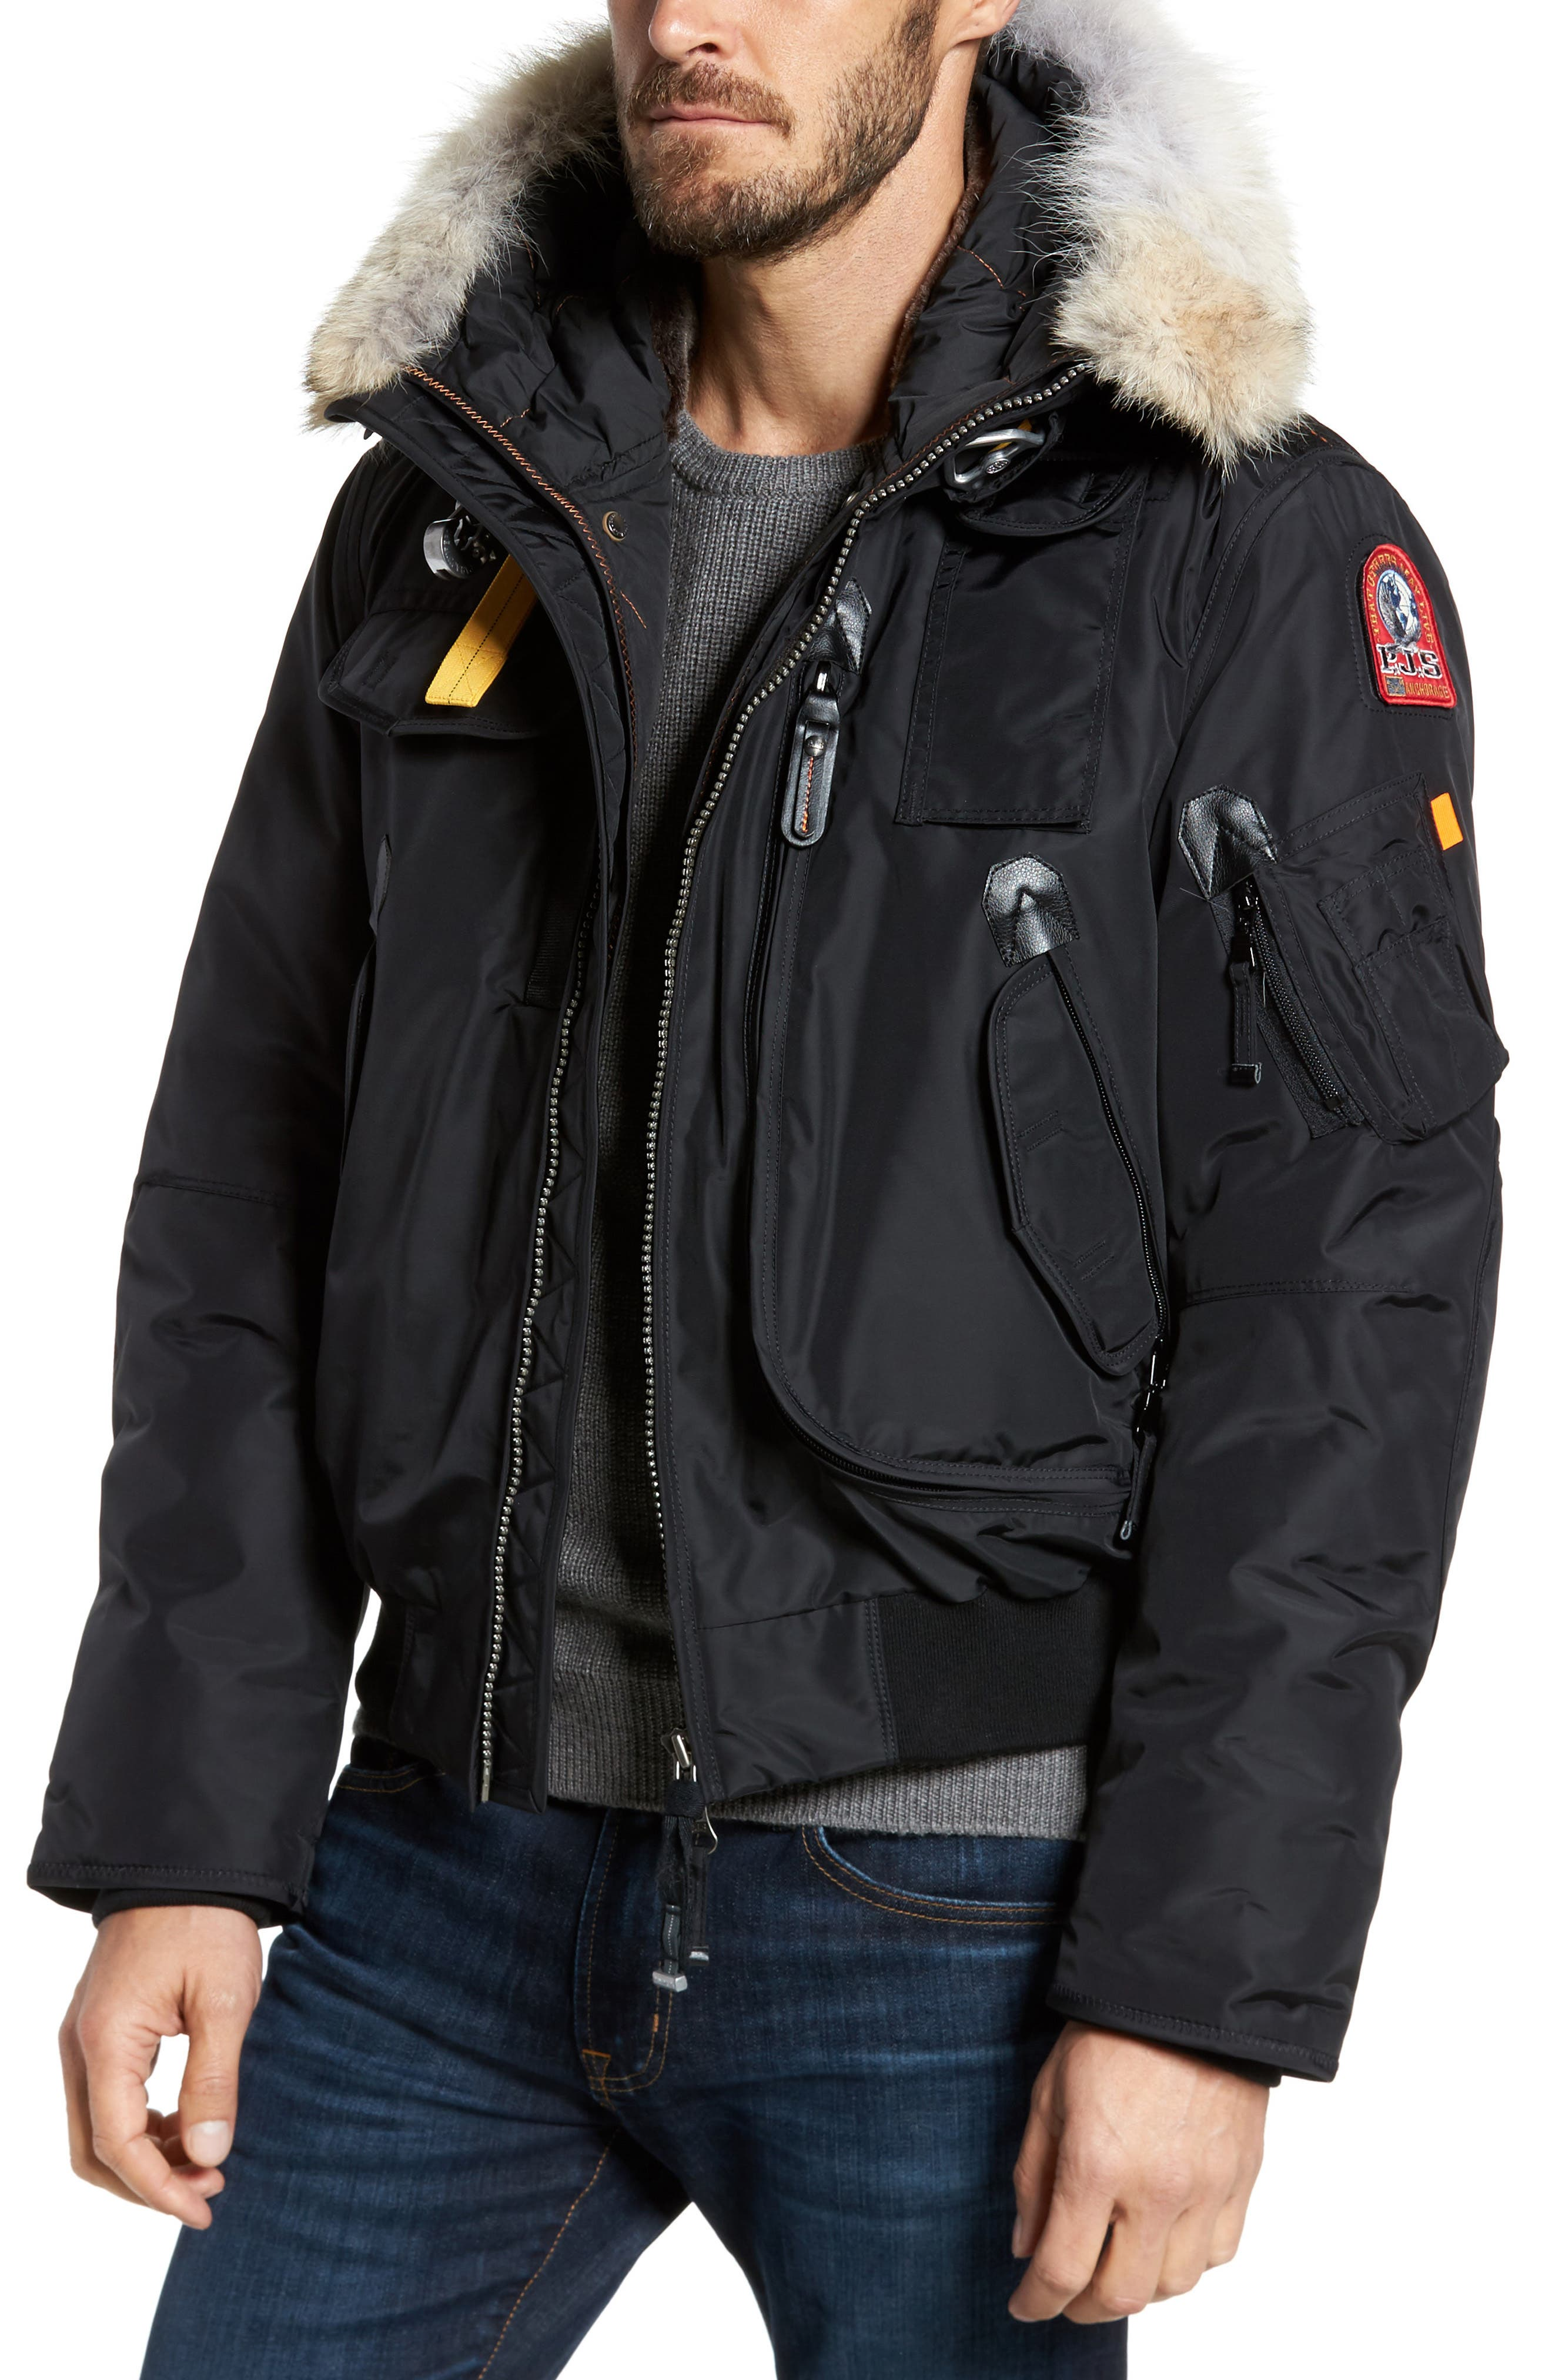 Parajumpers Slim Down Bomber Jacket with Faux Fur & Genuine Coyote Fur Trim